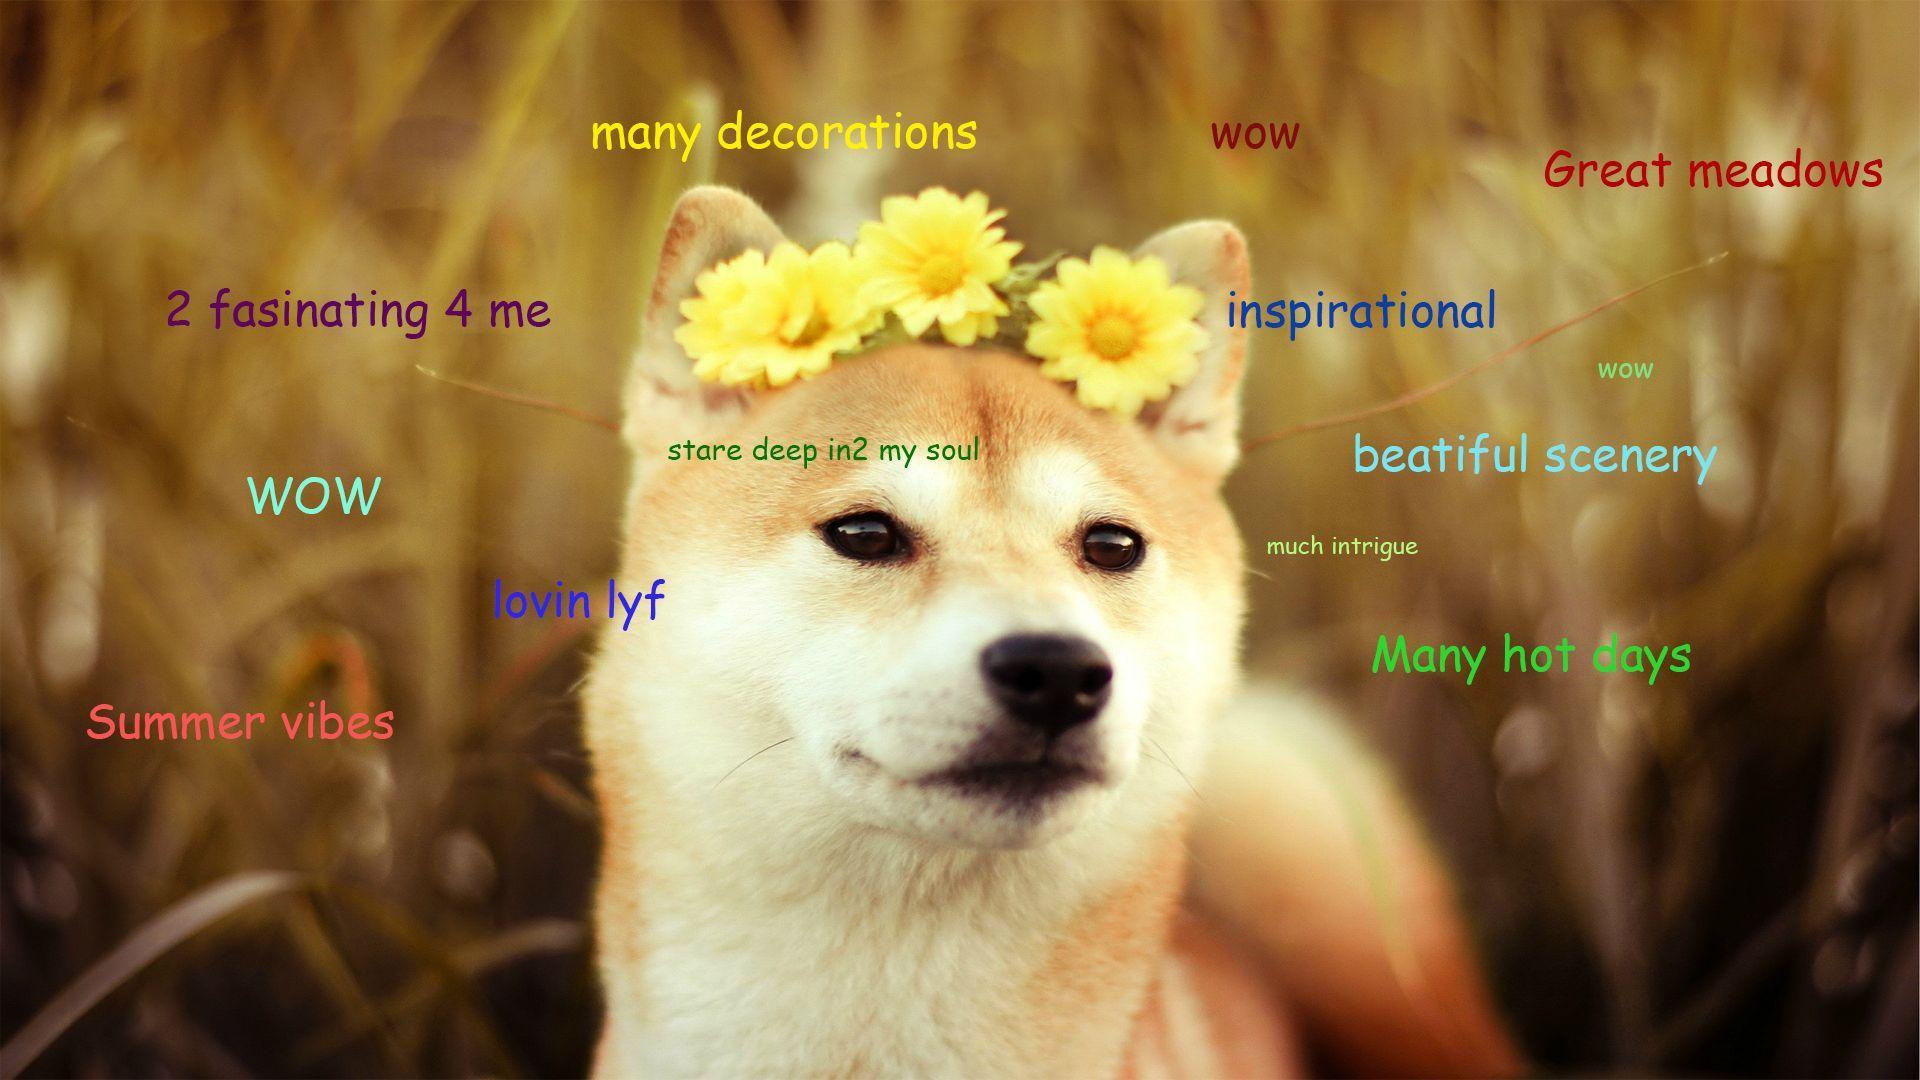 Ckwgcpe Jpg 1920 1080 Dog Jokes Shiba Inu Memes